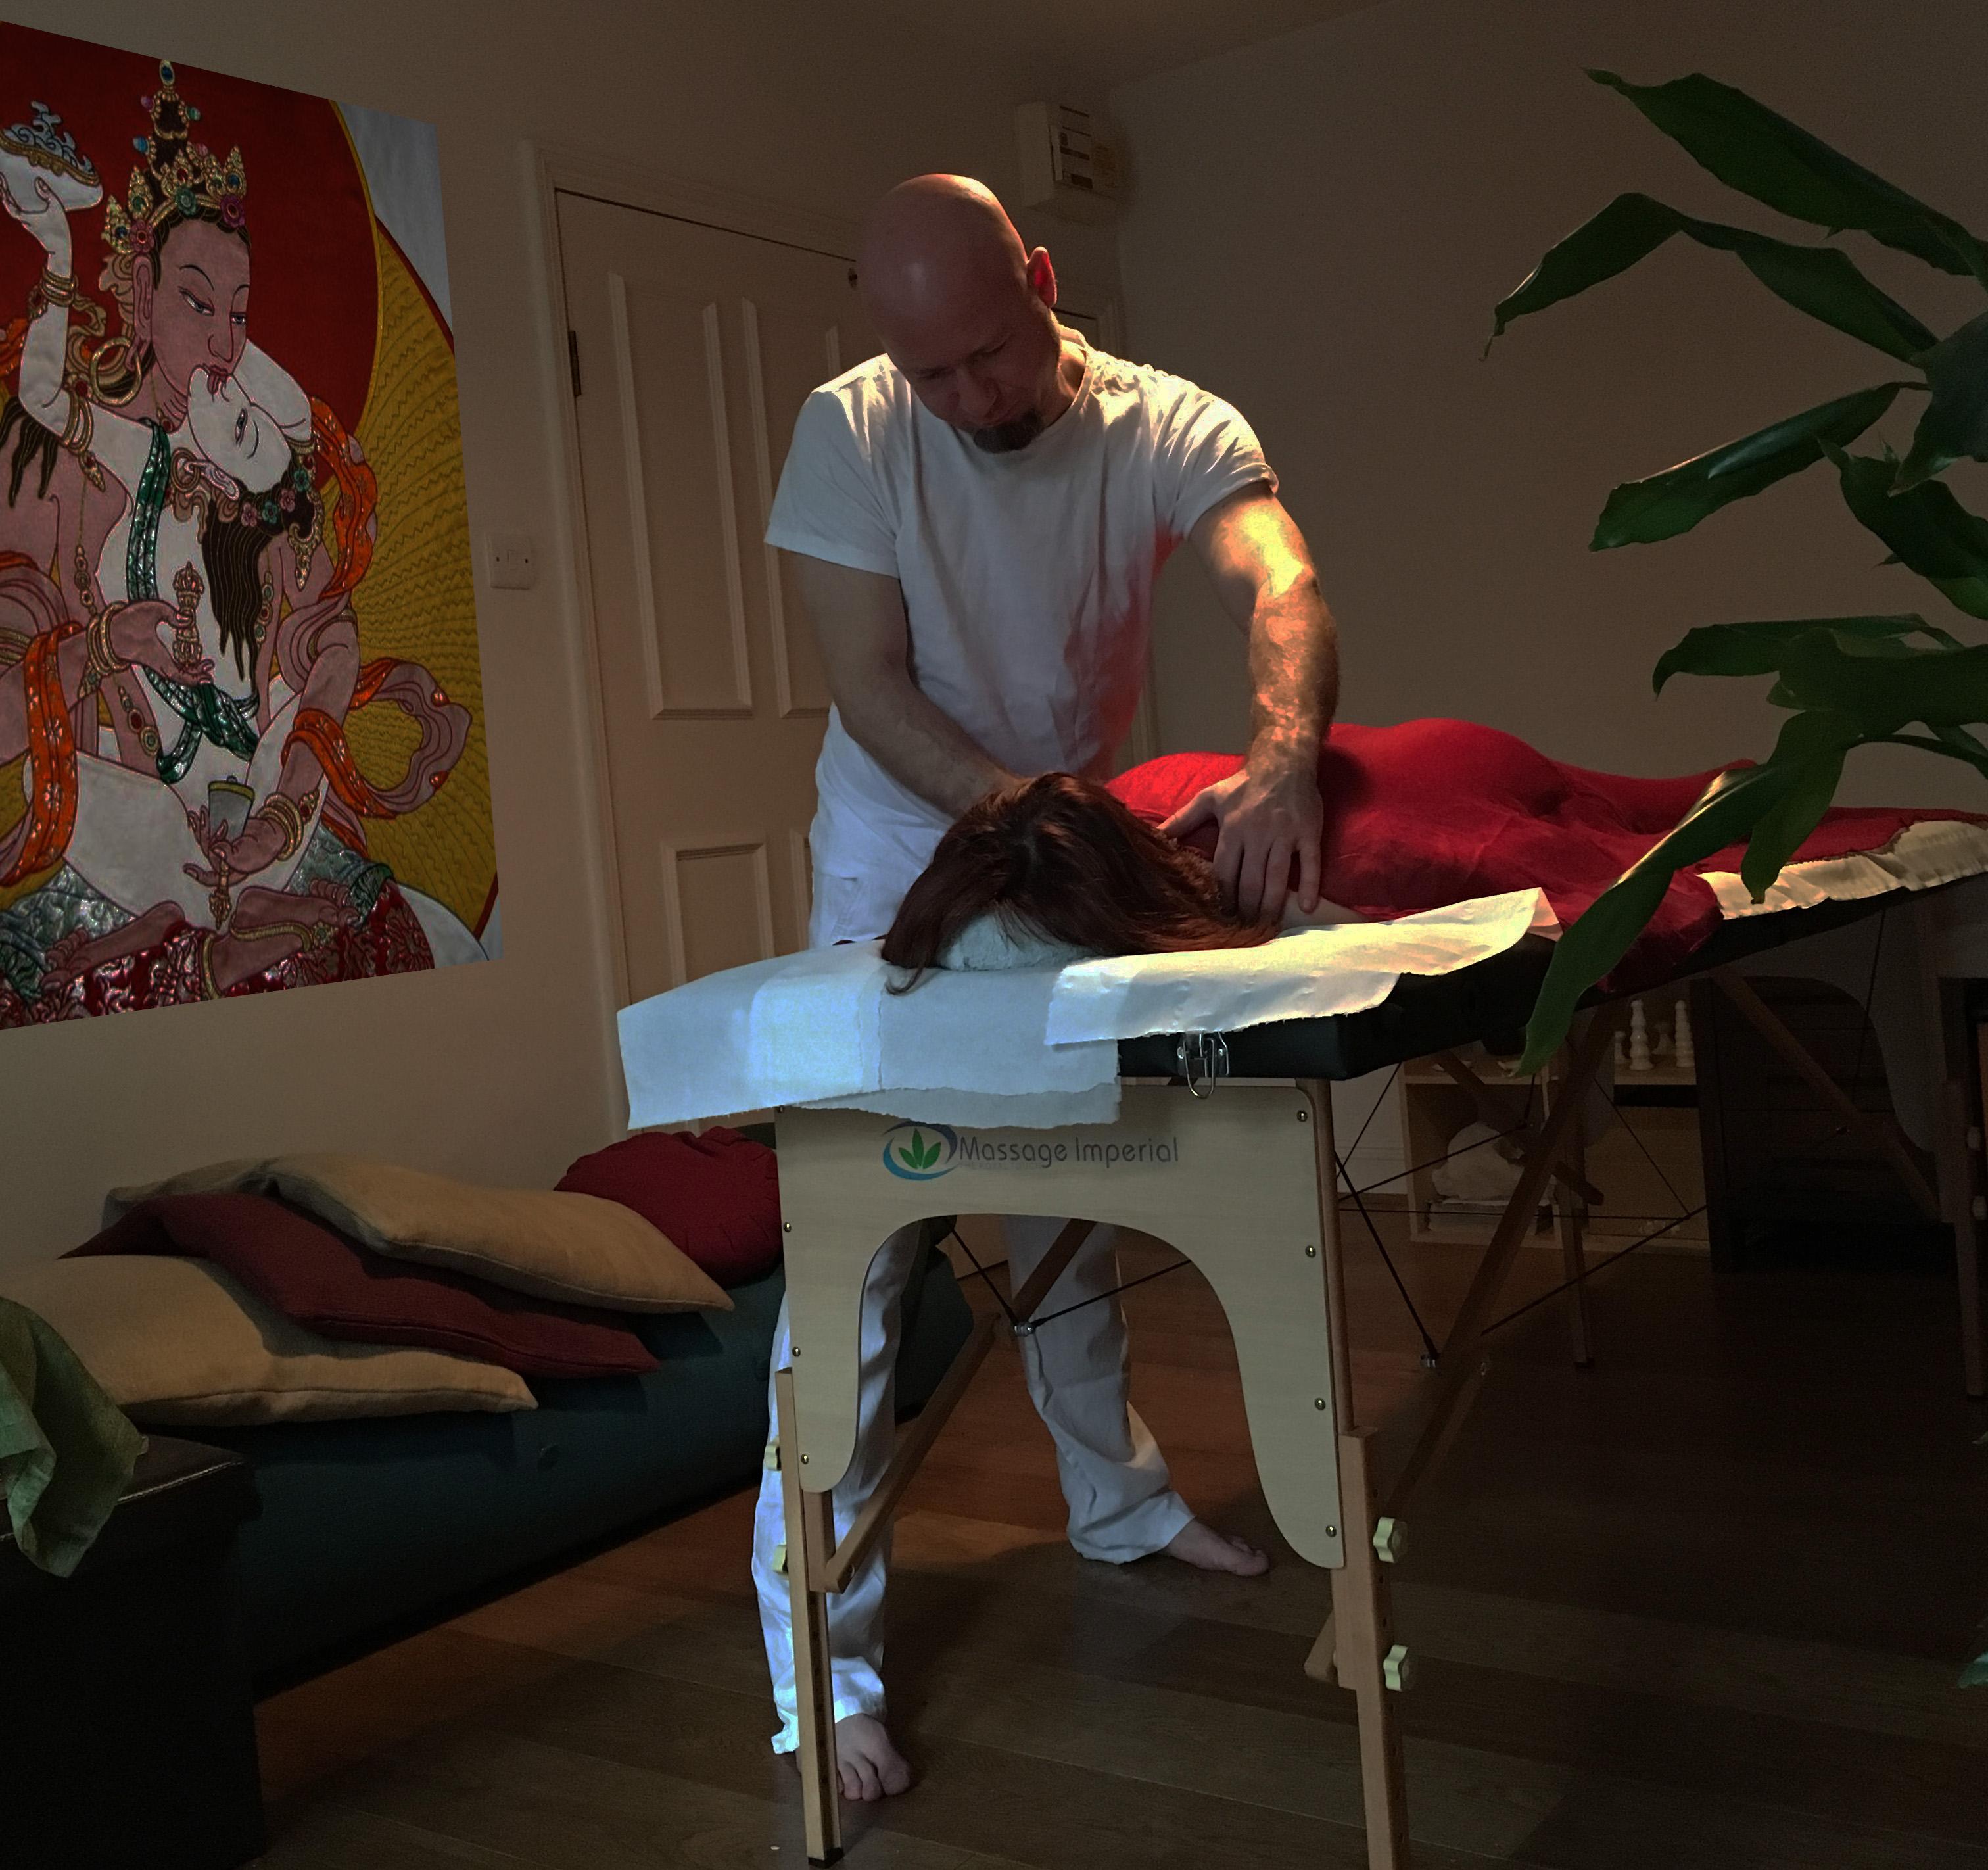 The tao massage session - 1 part 2